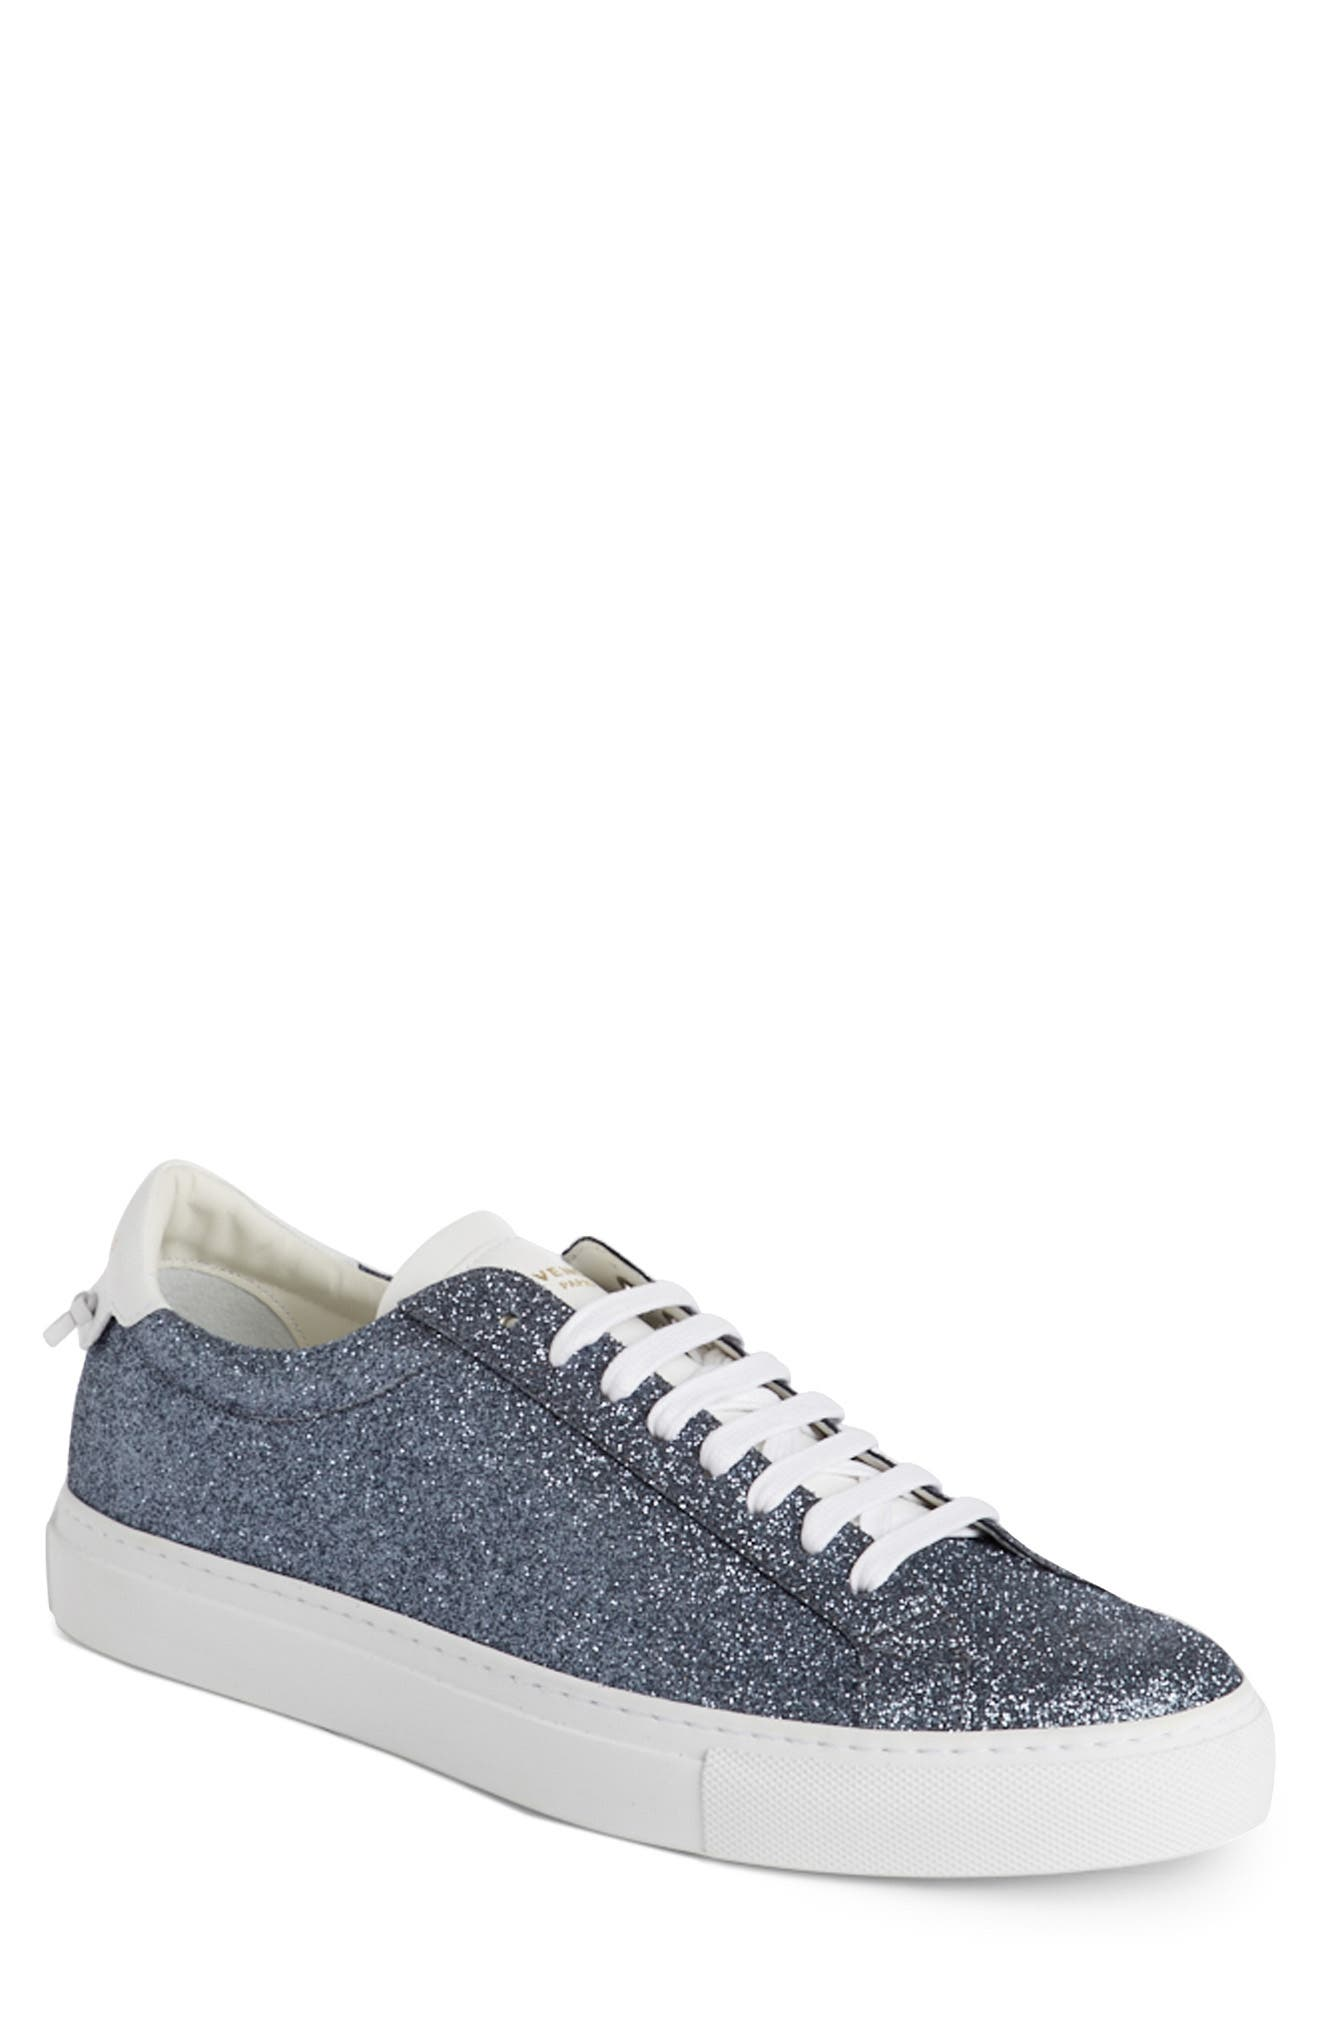 Urban Knots Glitter Sneaker,                             Main thumbnail 1, color,                             Grey